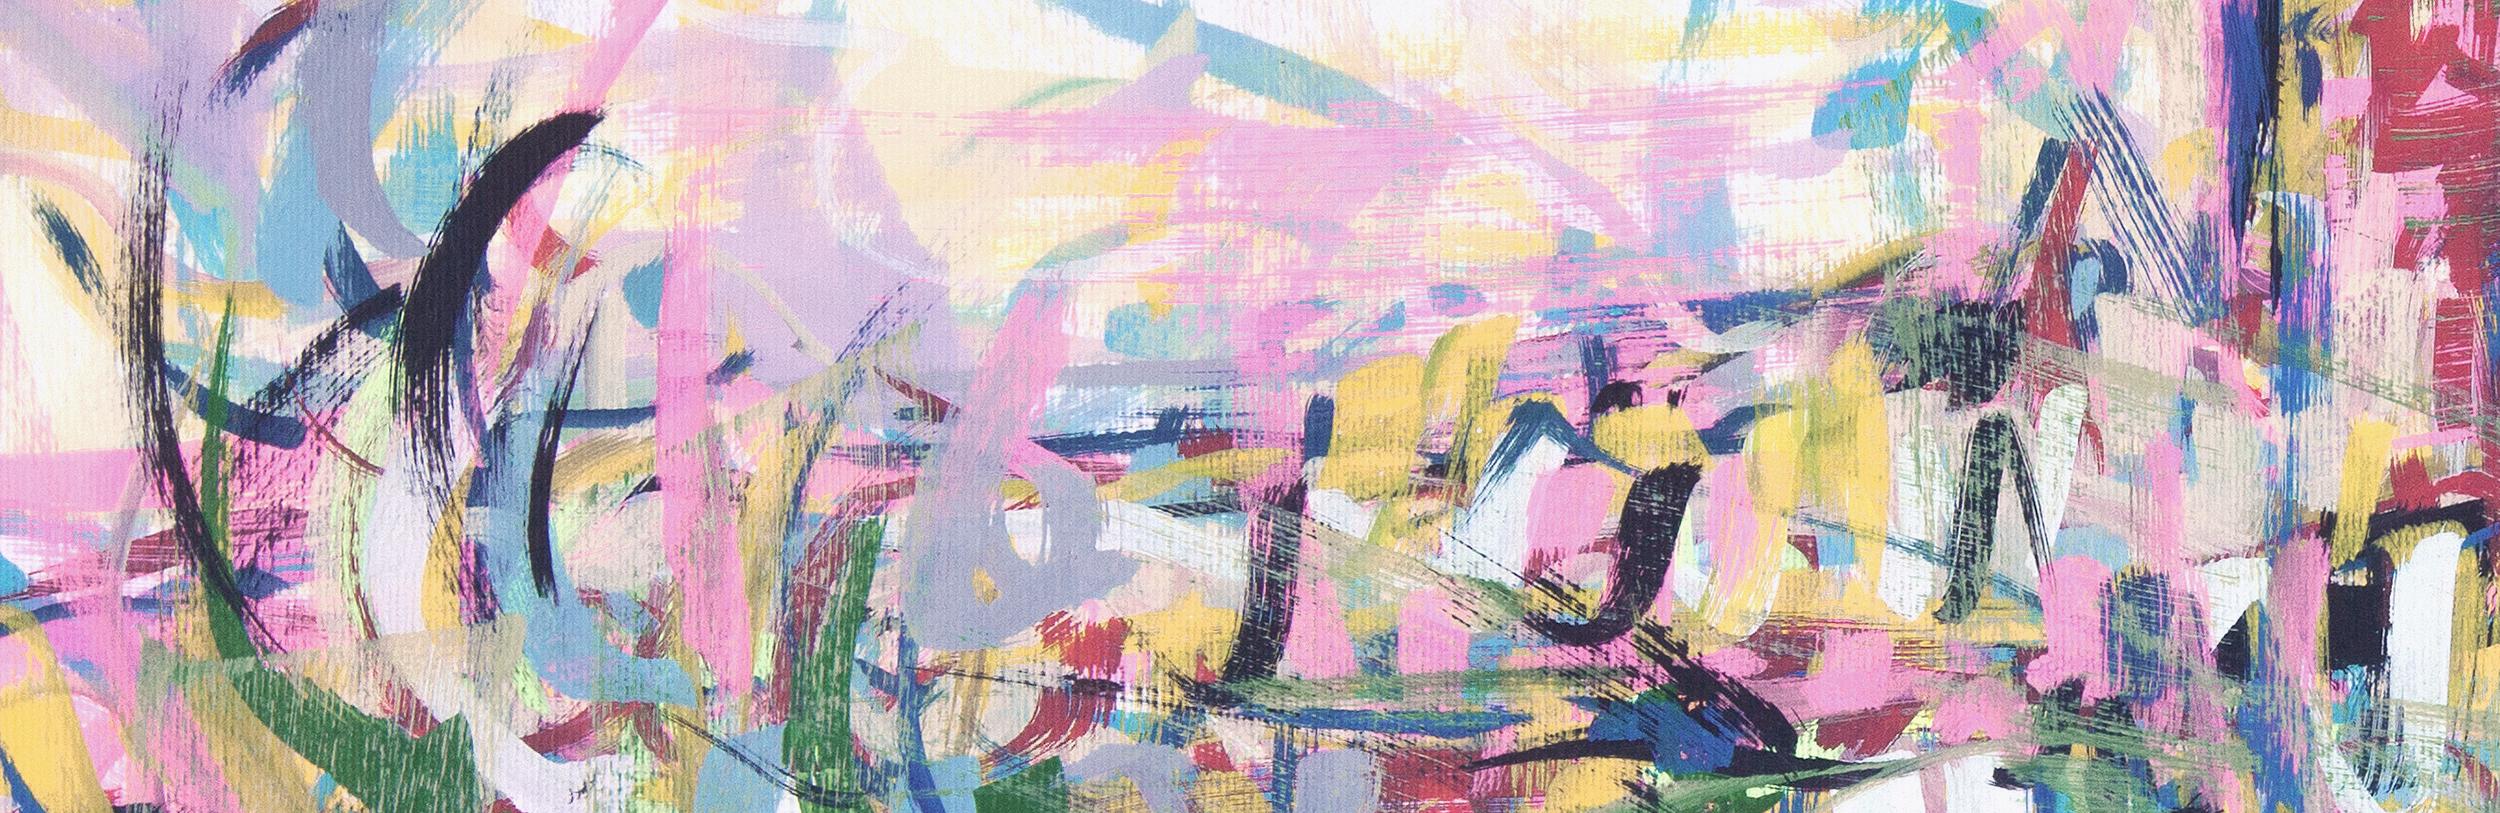 bonjourmolotov Margens Illustration Ilustracao painting pintura acrylic acrílico canvas tela paper cardboard mdf Andre Gigante 03N.jpg